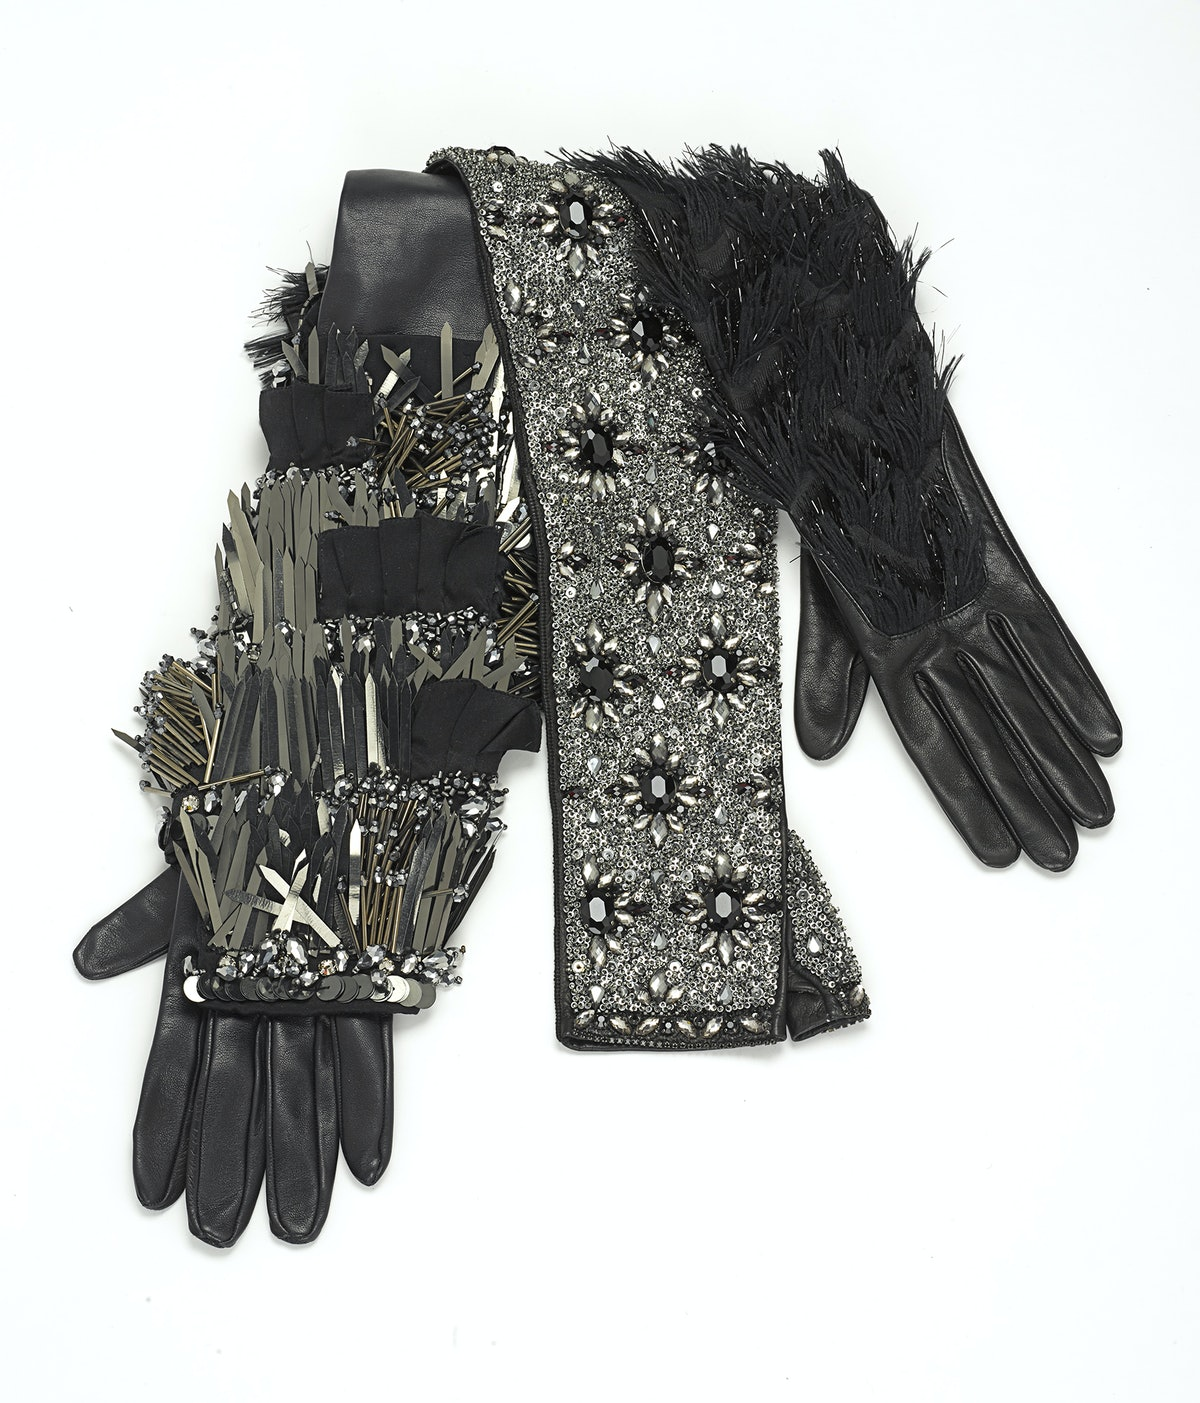 Best Fall Gloves